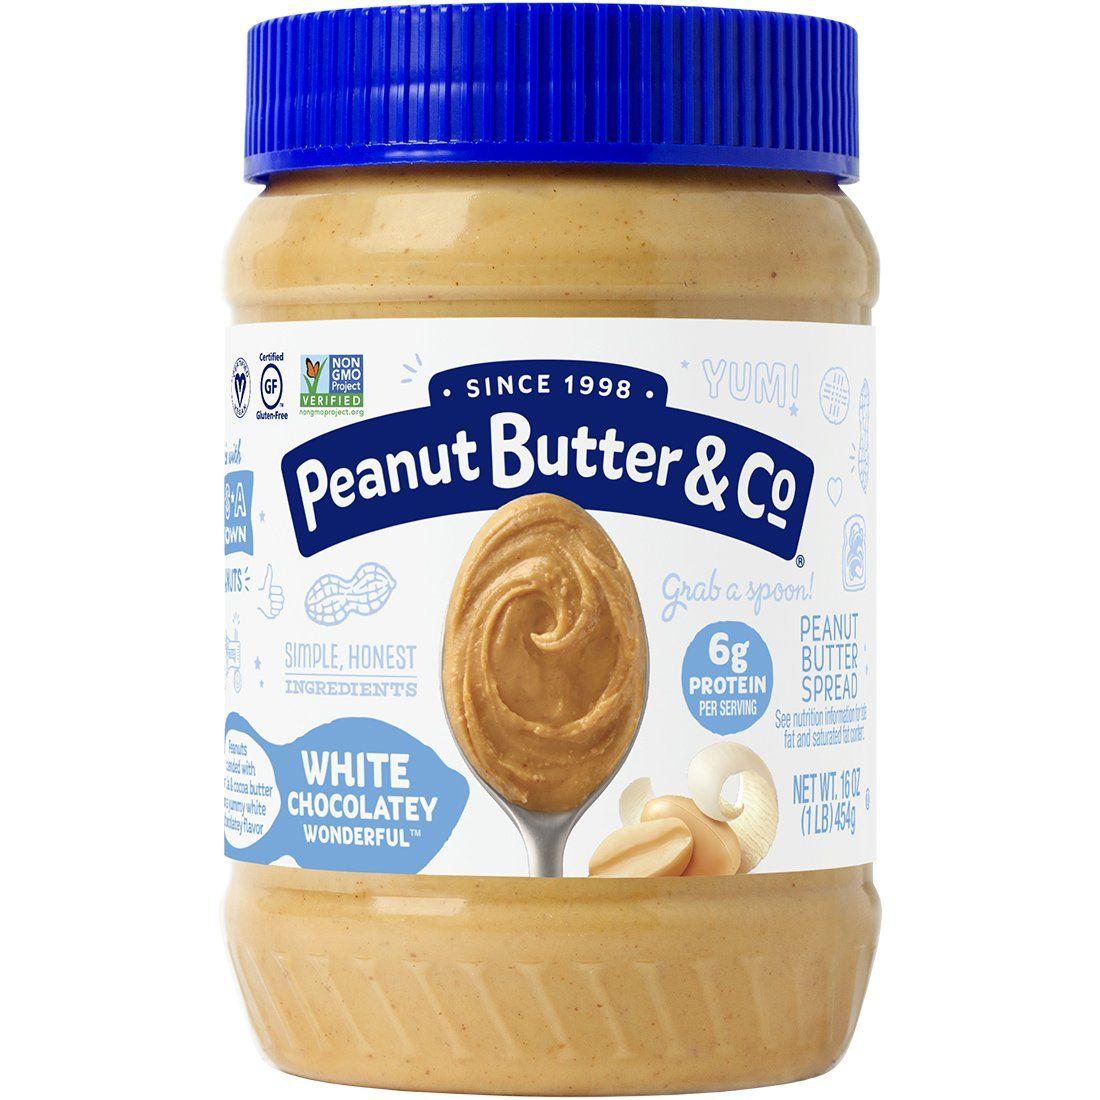 Peanut Butter & Co White Chocolate Wonderful